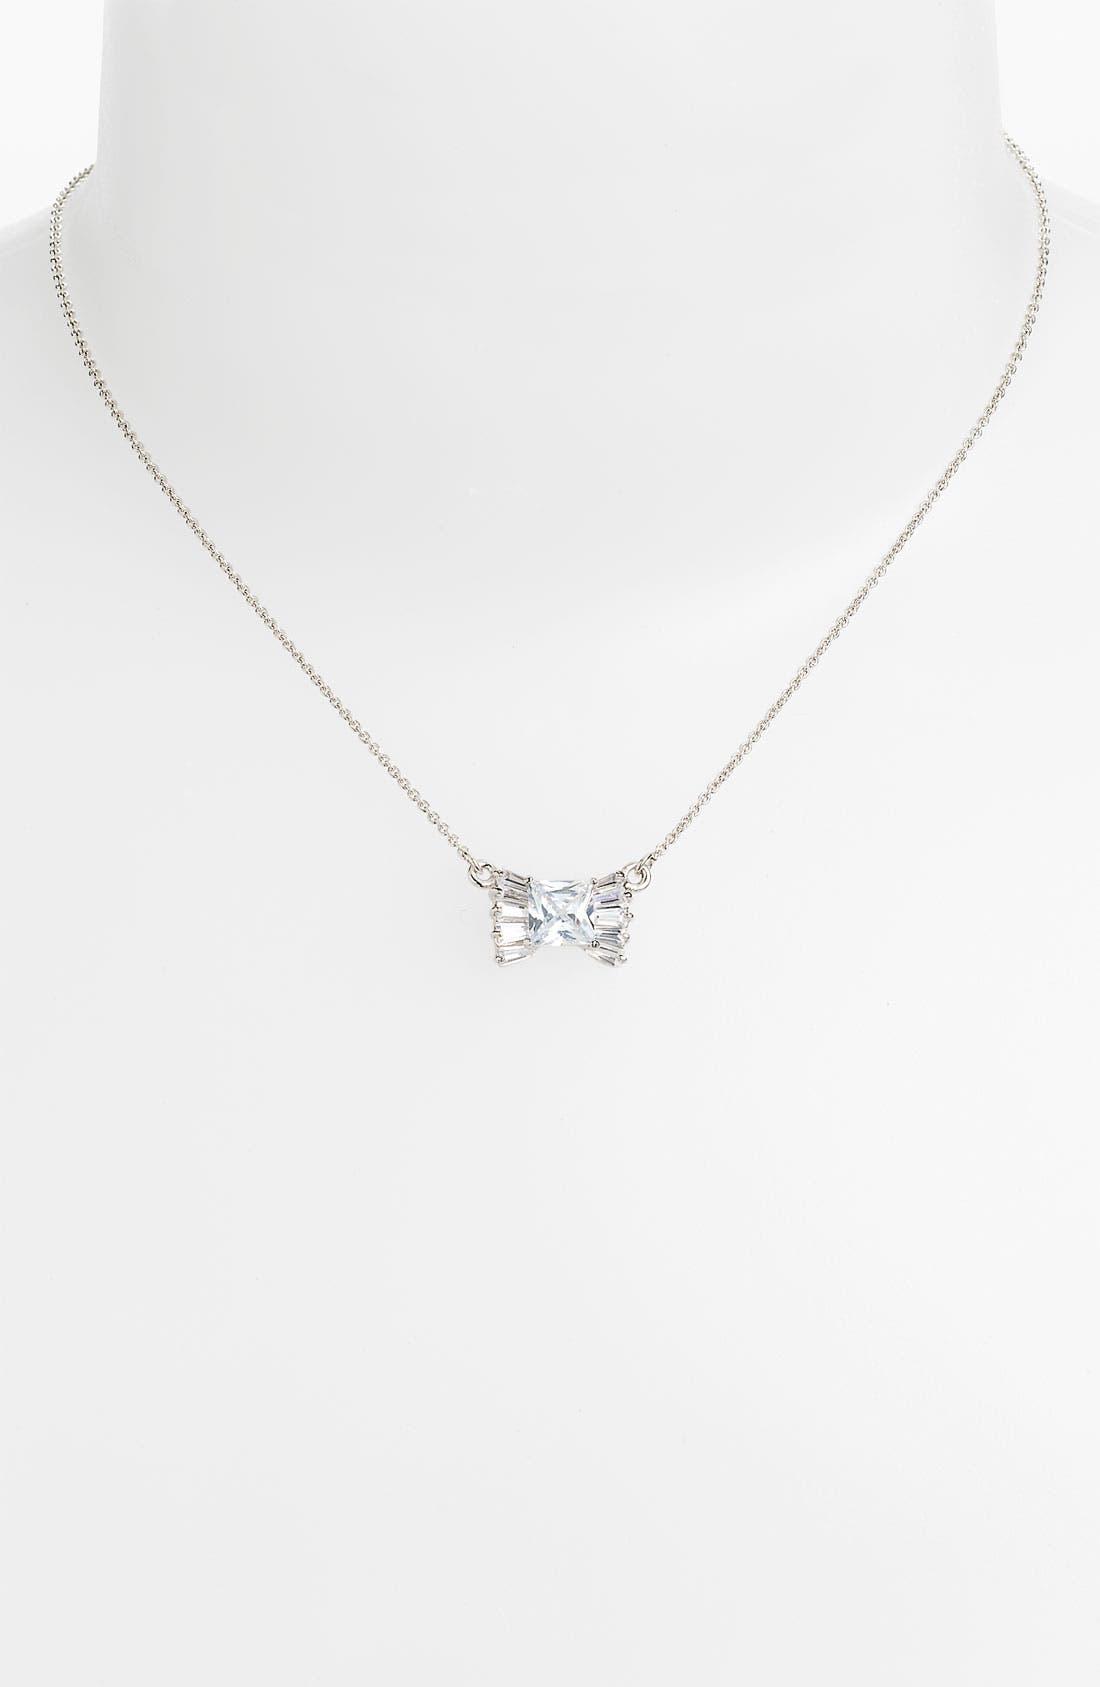 Main Image - kate spade new york 'le soir' bow pendant necklace